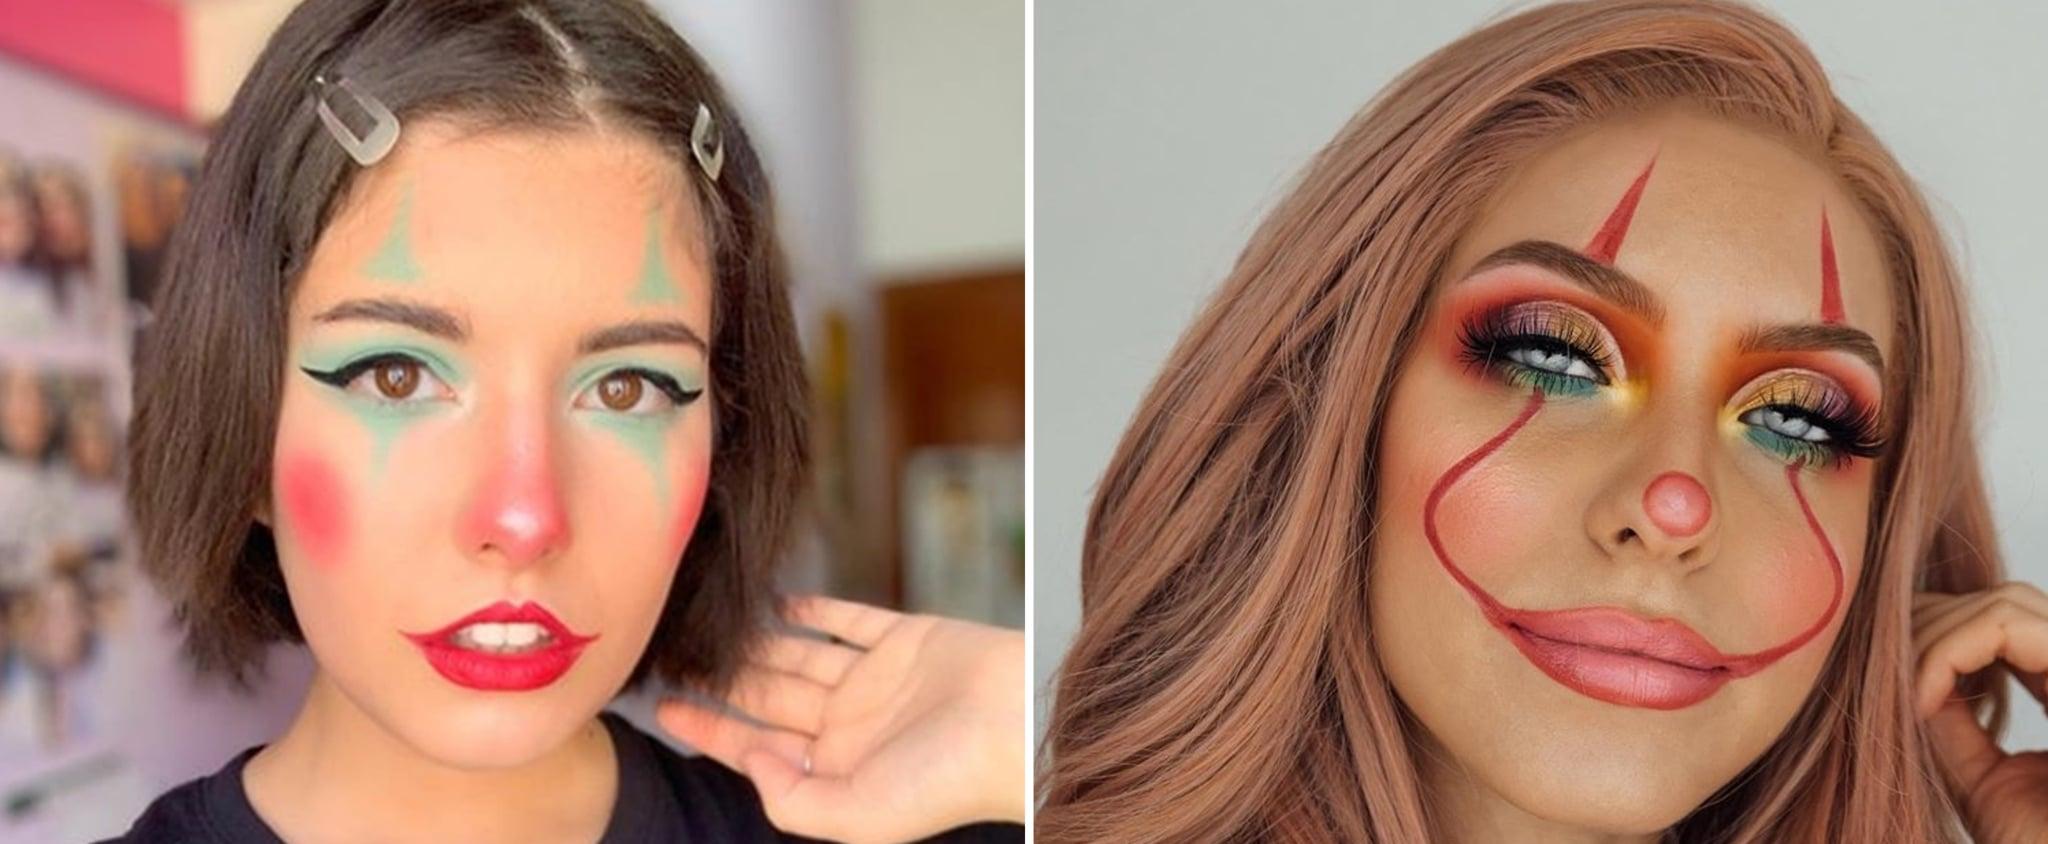 27 Pretty And Cute Clown Halloween Makeup Looks Popsugar Beauty Uk